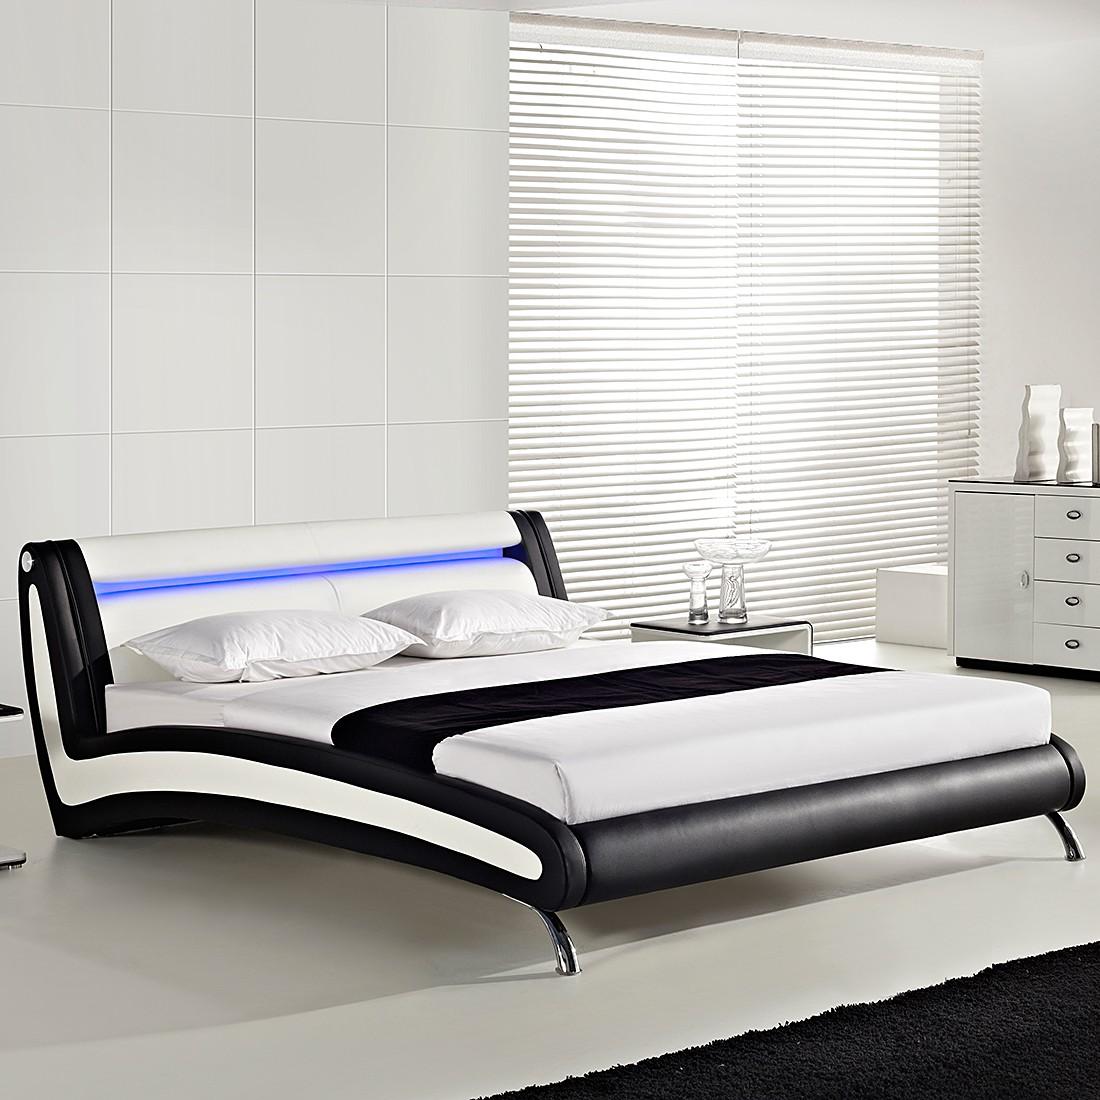 20 sparen polsterbett picard nur 399 99 cherry m bel home24. Black Bedroom Furniture Sets. Home Design Ideas